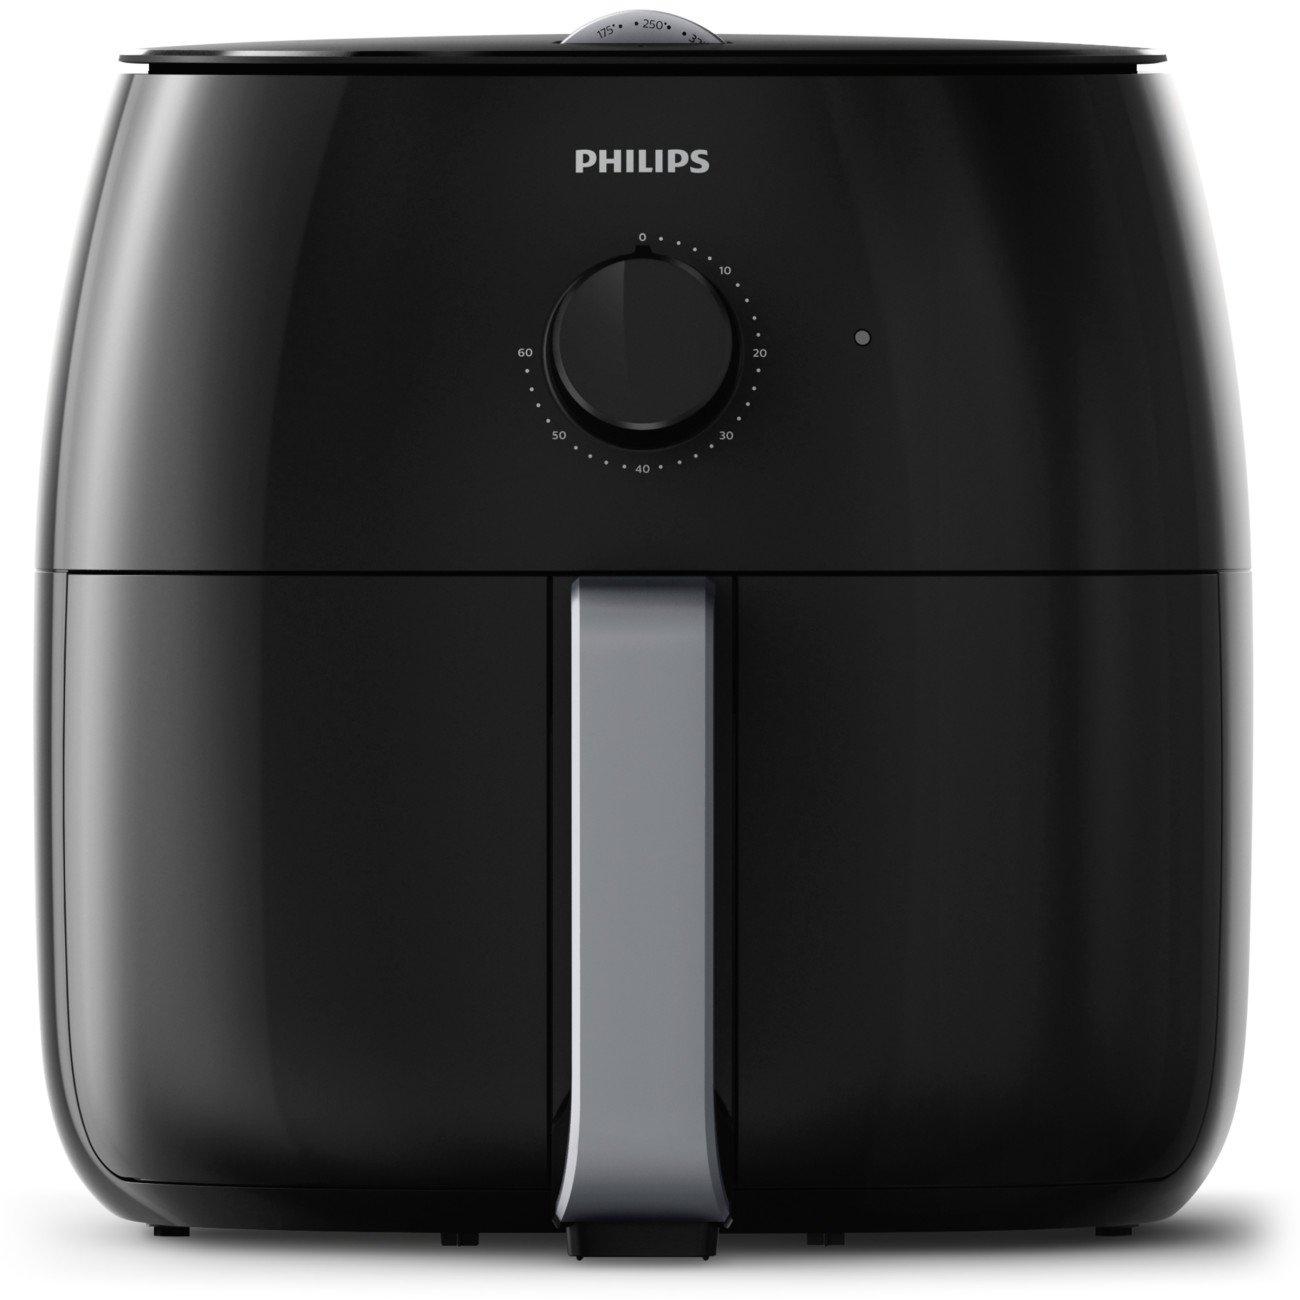 Philips HD9630 98 Turbostar Airfryer